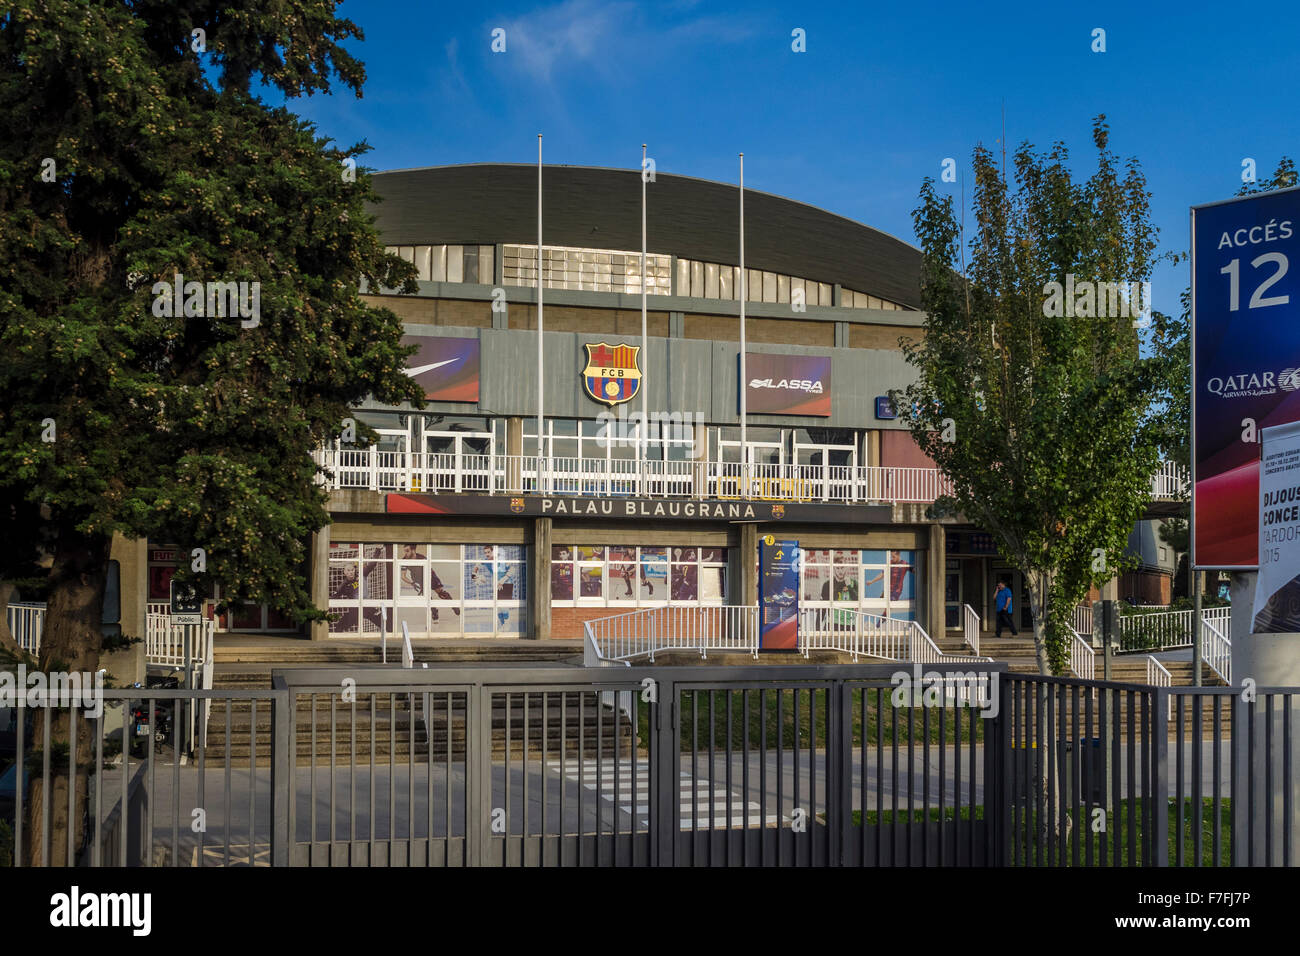 Exterior of the sporting venue, Palau Blaugrana, Camp Nou, Barcelona, Catalonia, Spain - Stock Image